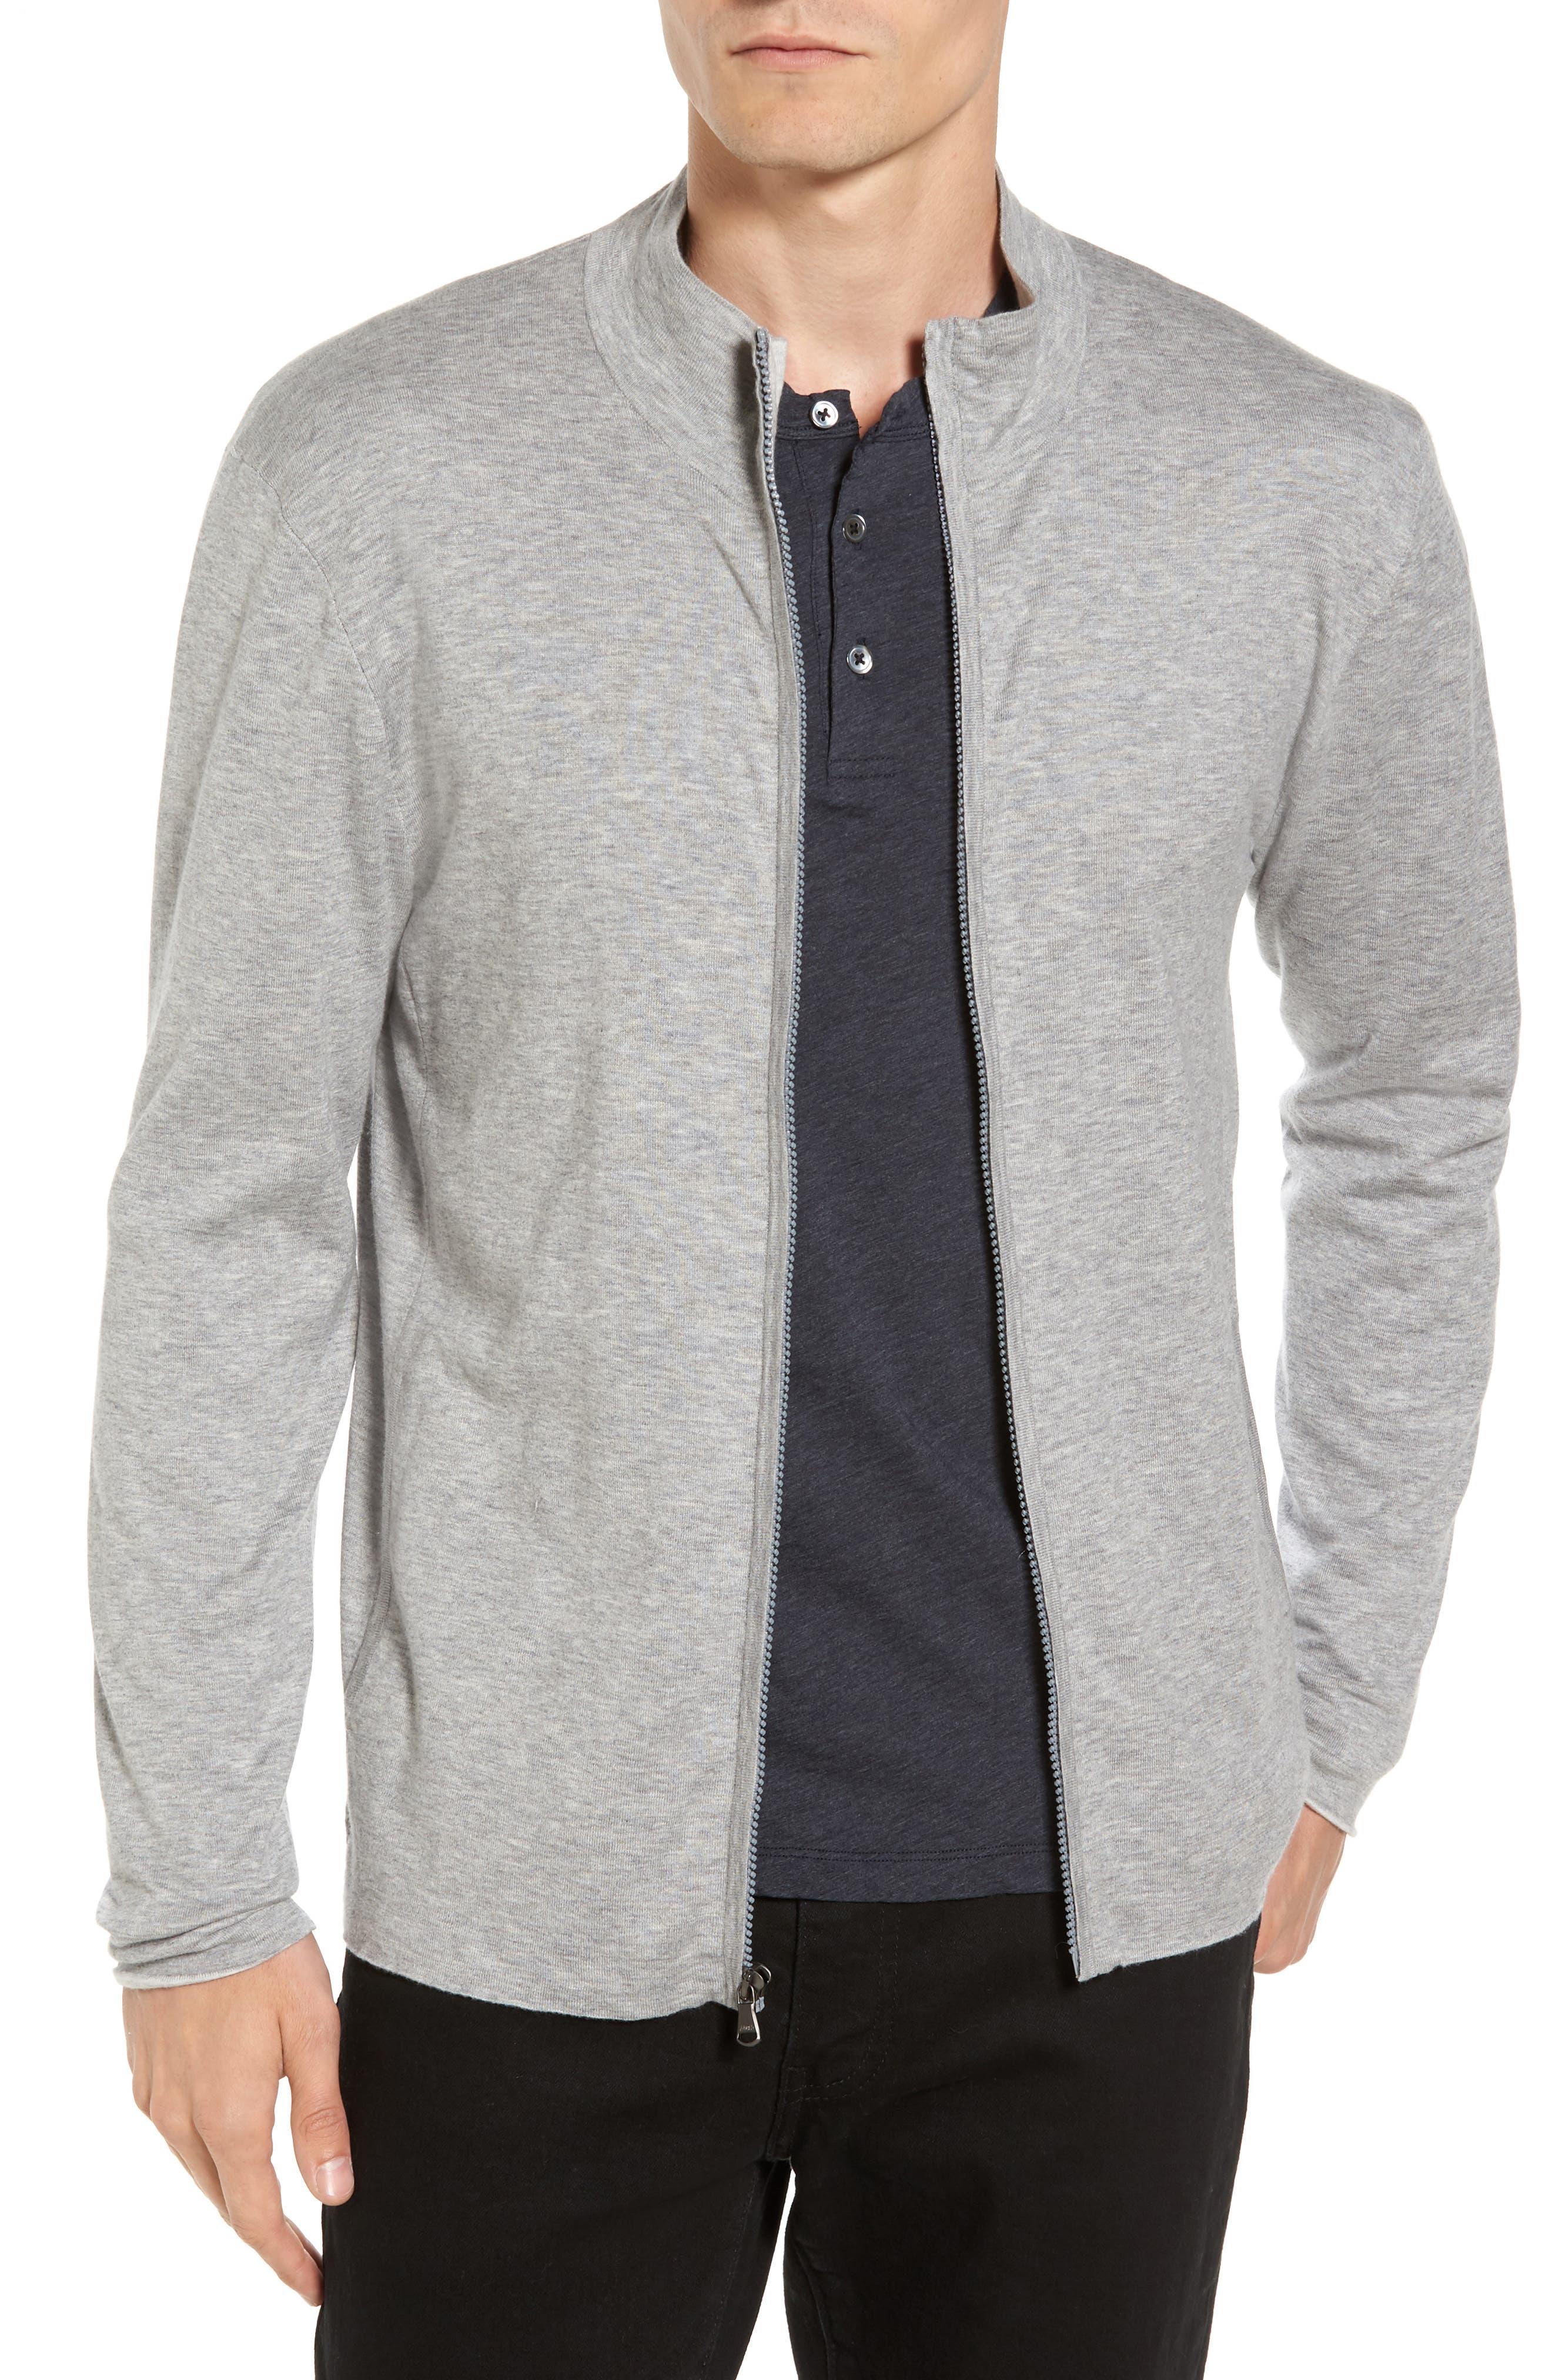 Mock Neck Zip Sweatshirt,                             Main thumbnail 1, color,                             Heather Grey/ Platinum